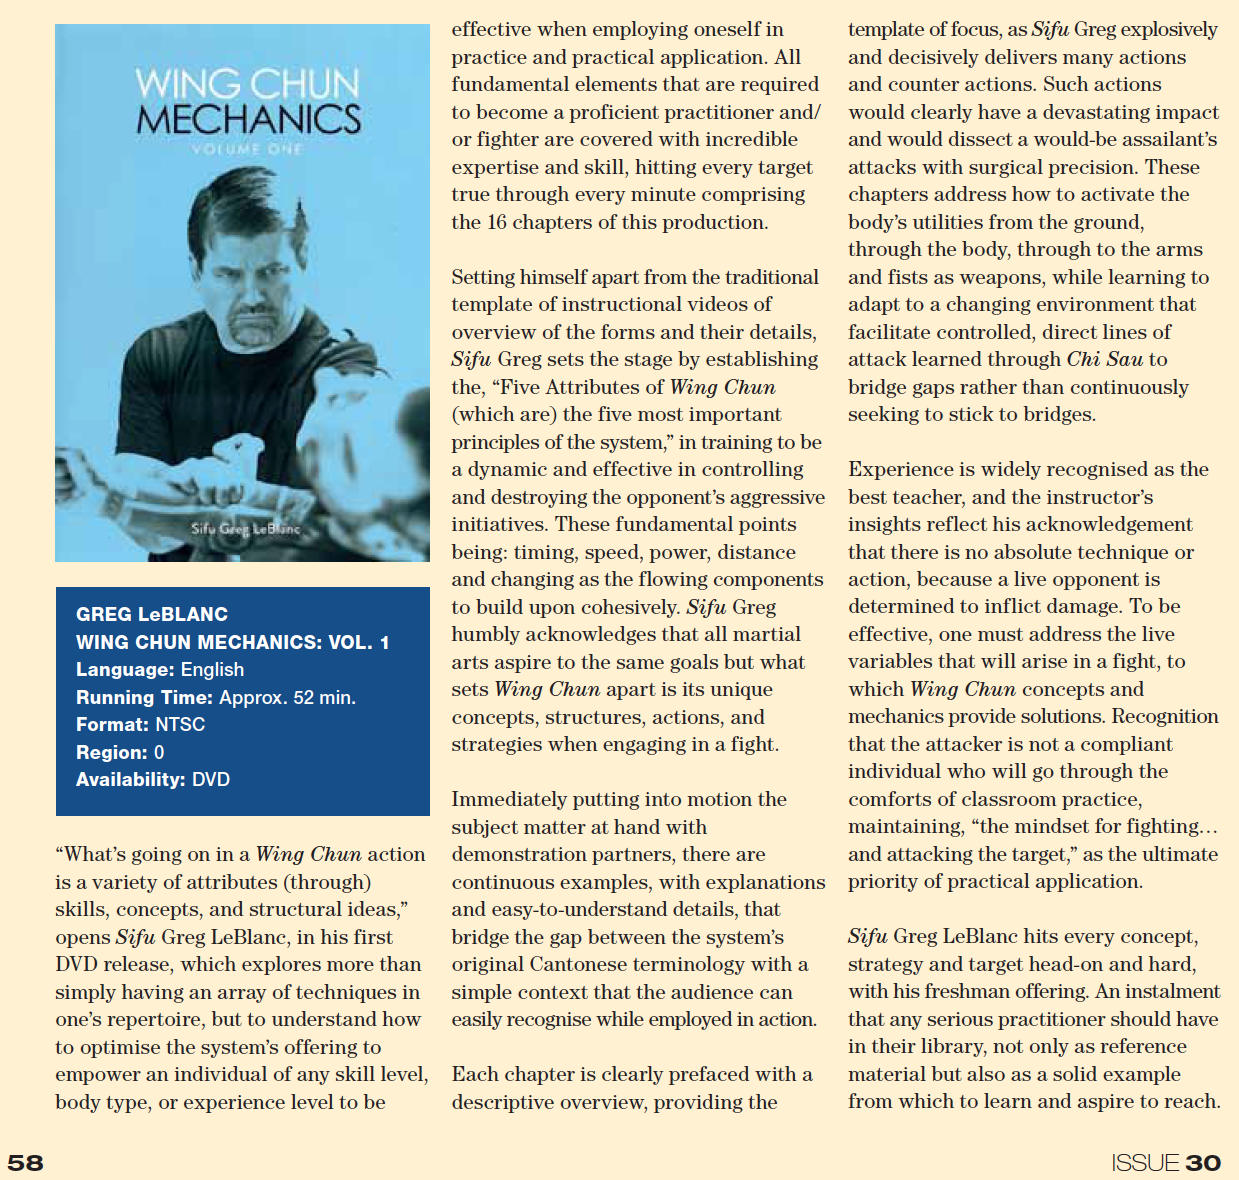 WCI Review - Issue 30a - Greg LeBlanc - DVD1